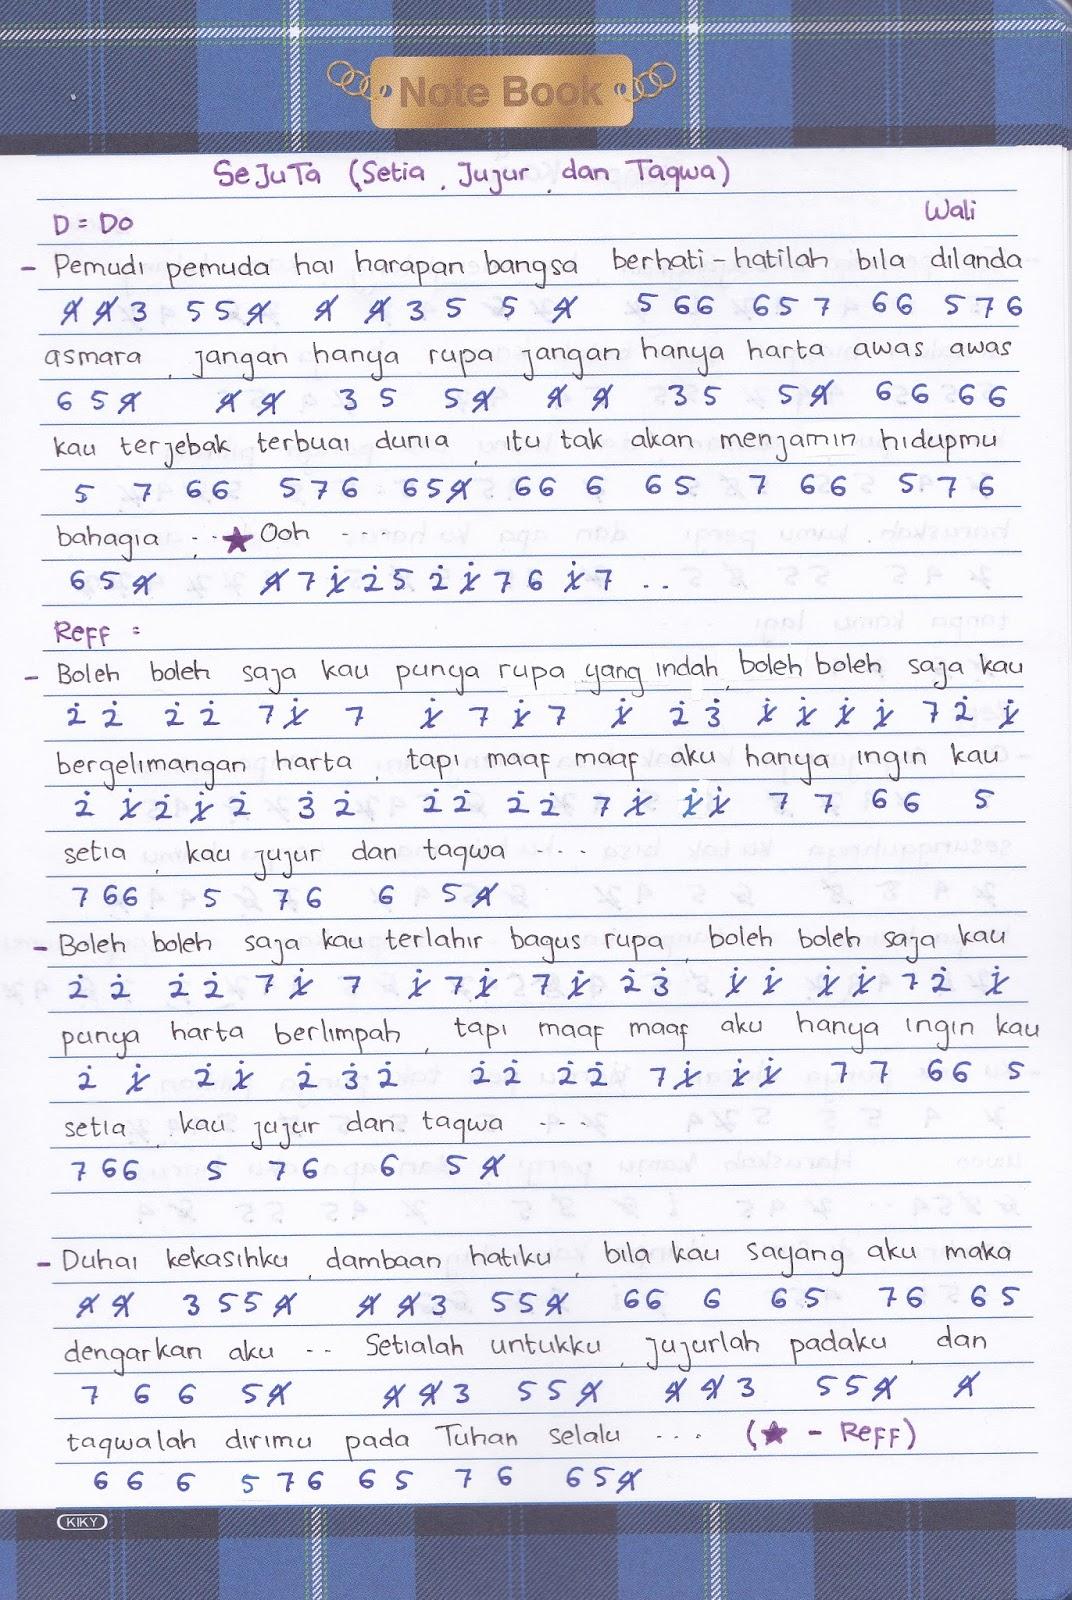 Chord Lagu Wali | wali band antara aku kau dan batu akik ku lirik chord, koleksi not angka not ...